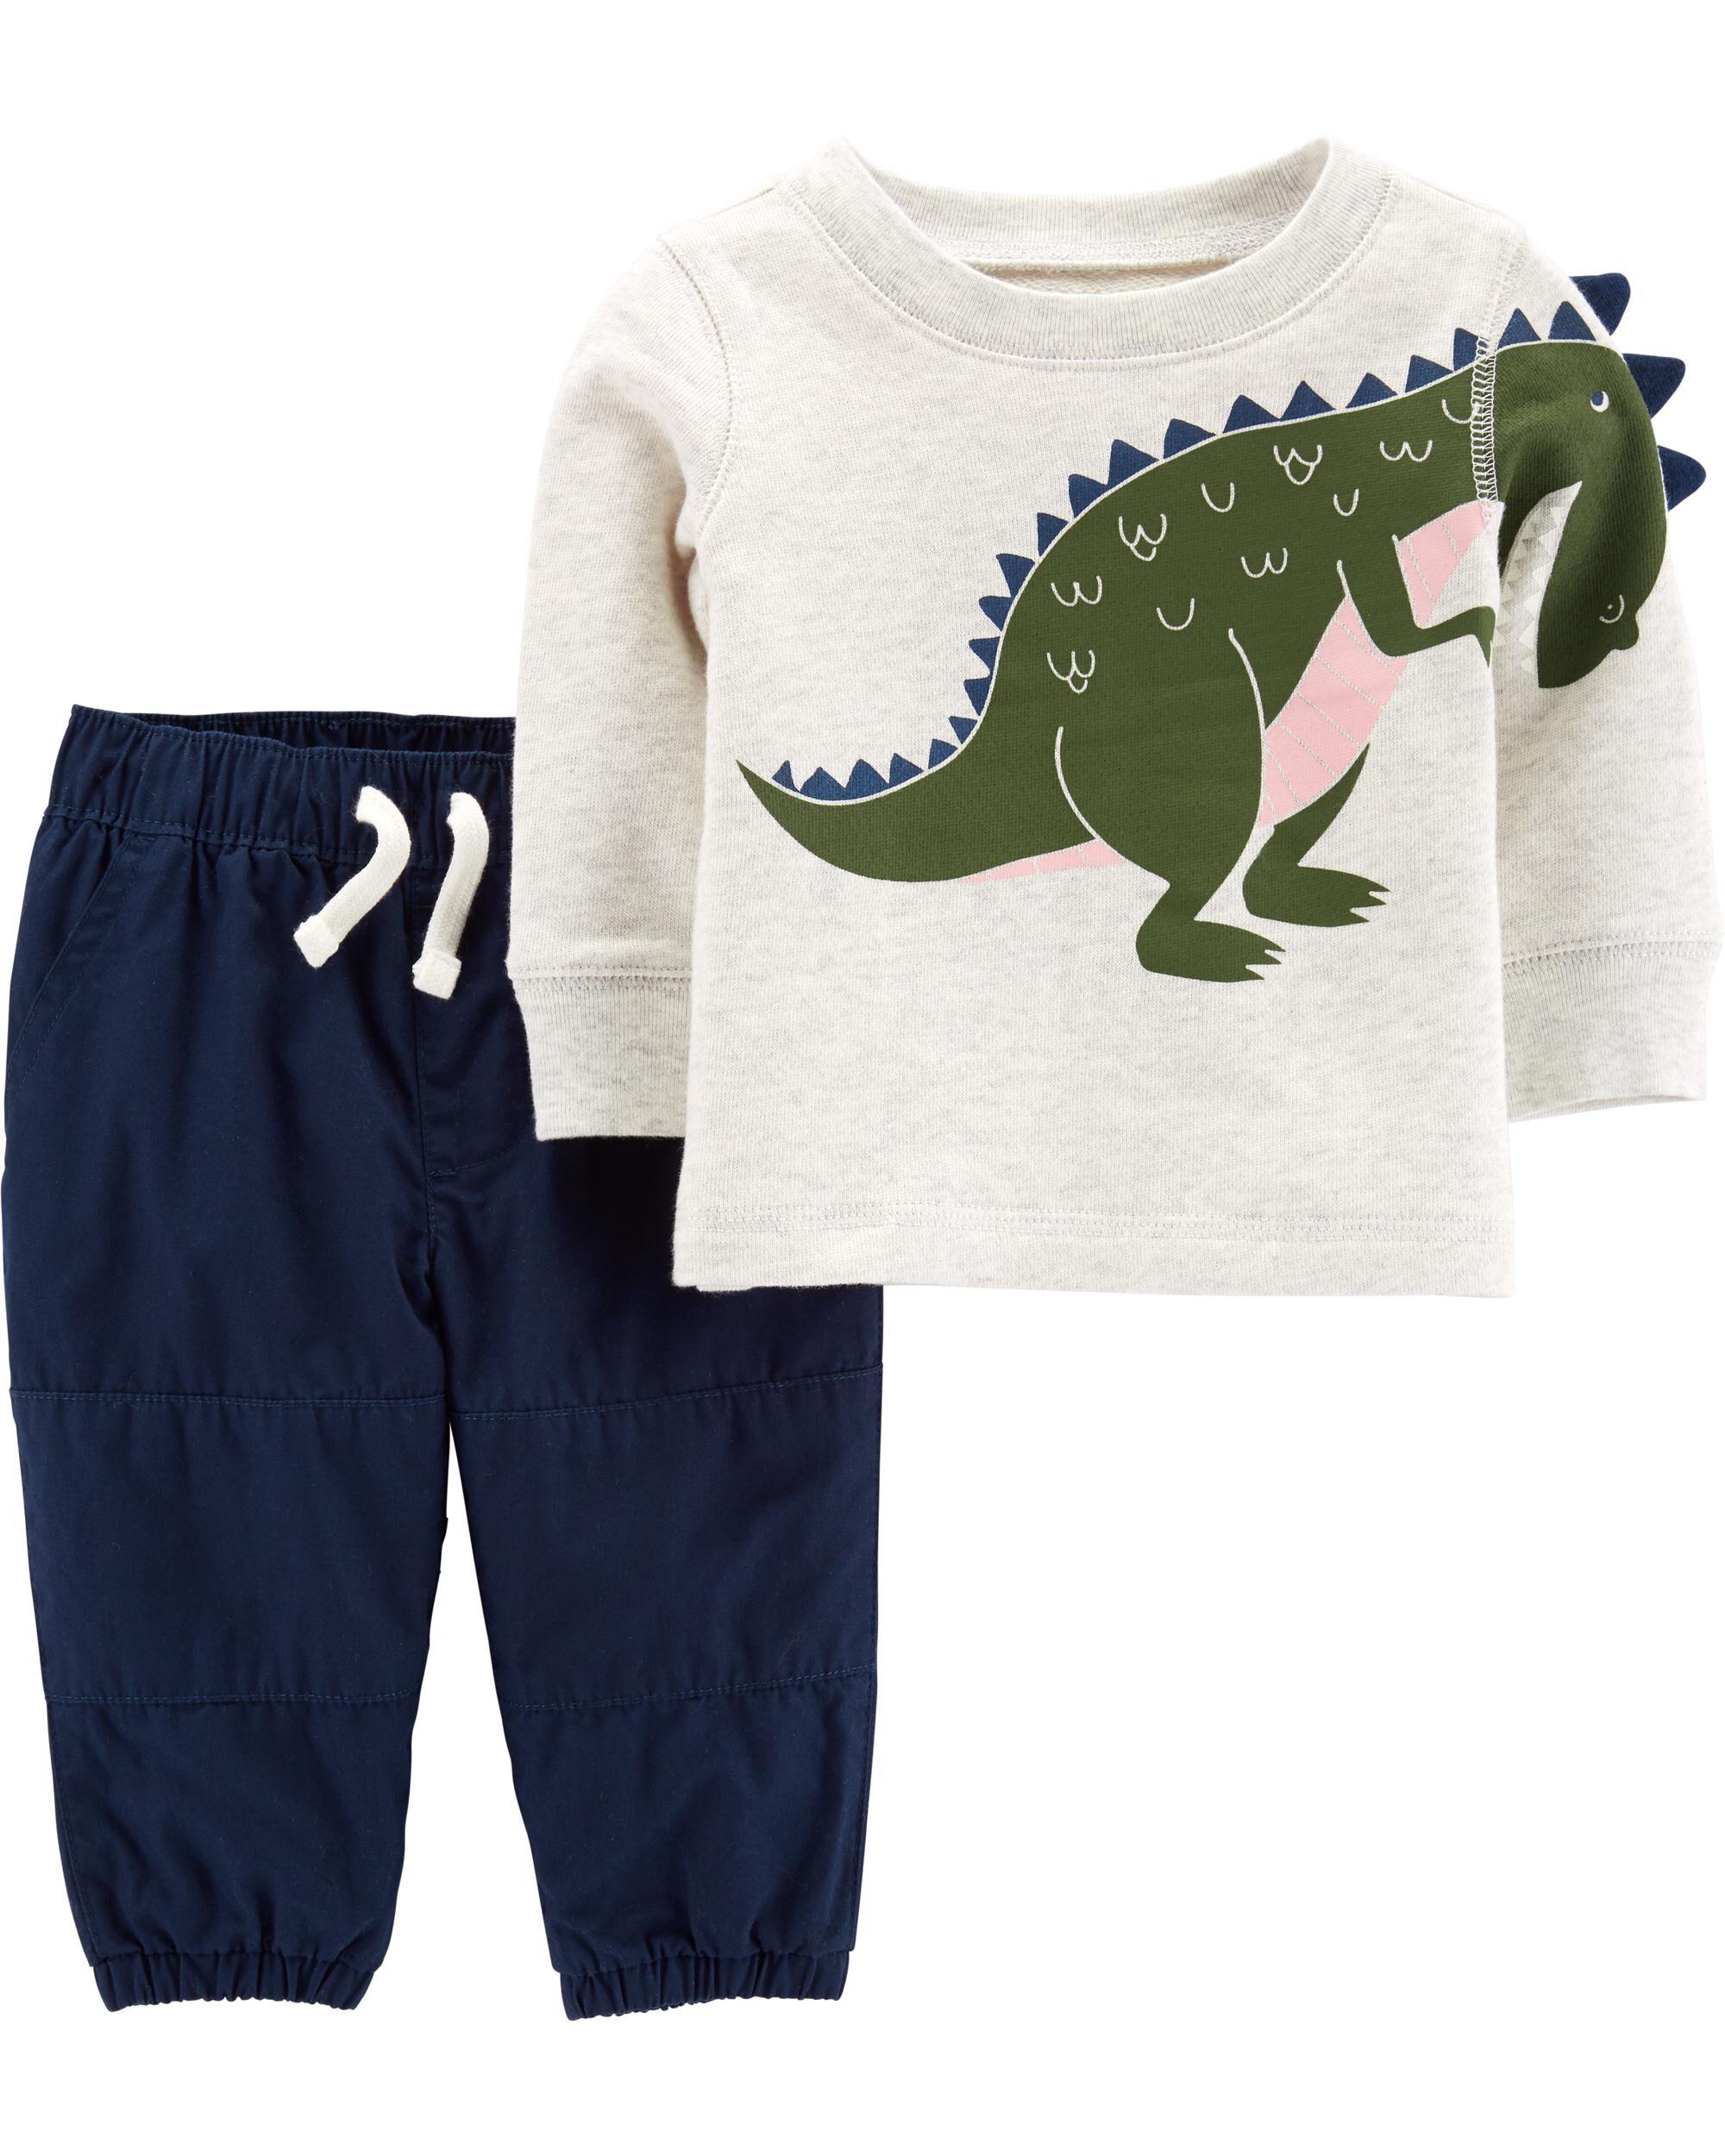 c0e8fb1e6 2-Piece Dinosaur Top & Poplin Pant Set. Loading zoom